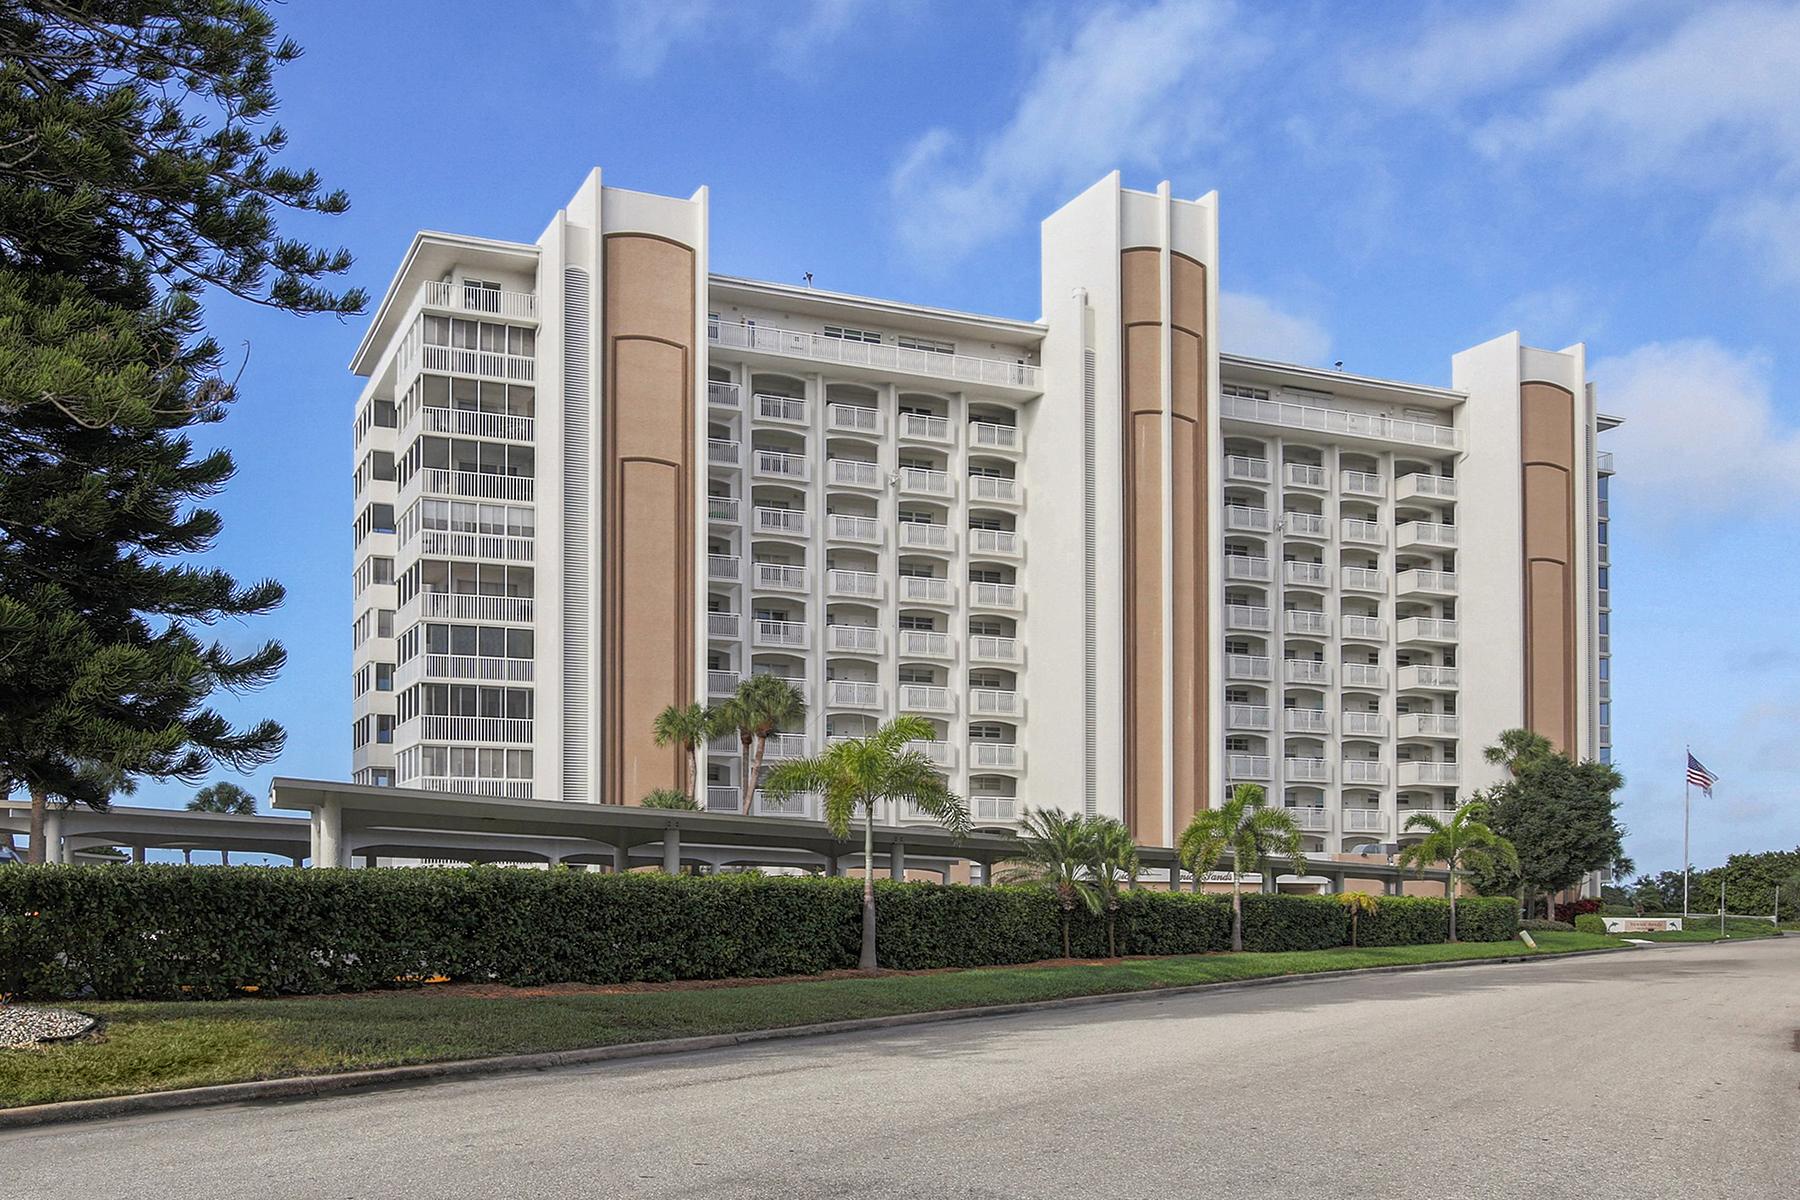 Condominium for Sale at VENICE SANDS - VENICE ISLAND 633 Alhambra Rd 308 Venice, Florida 34285 United States